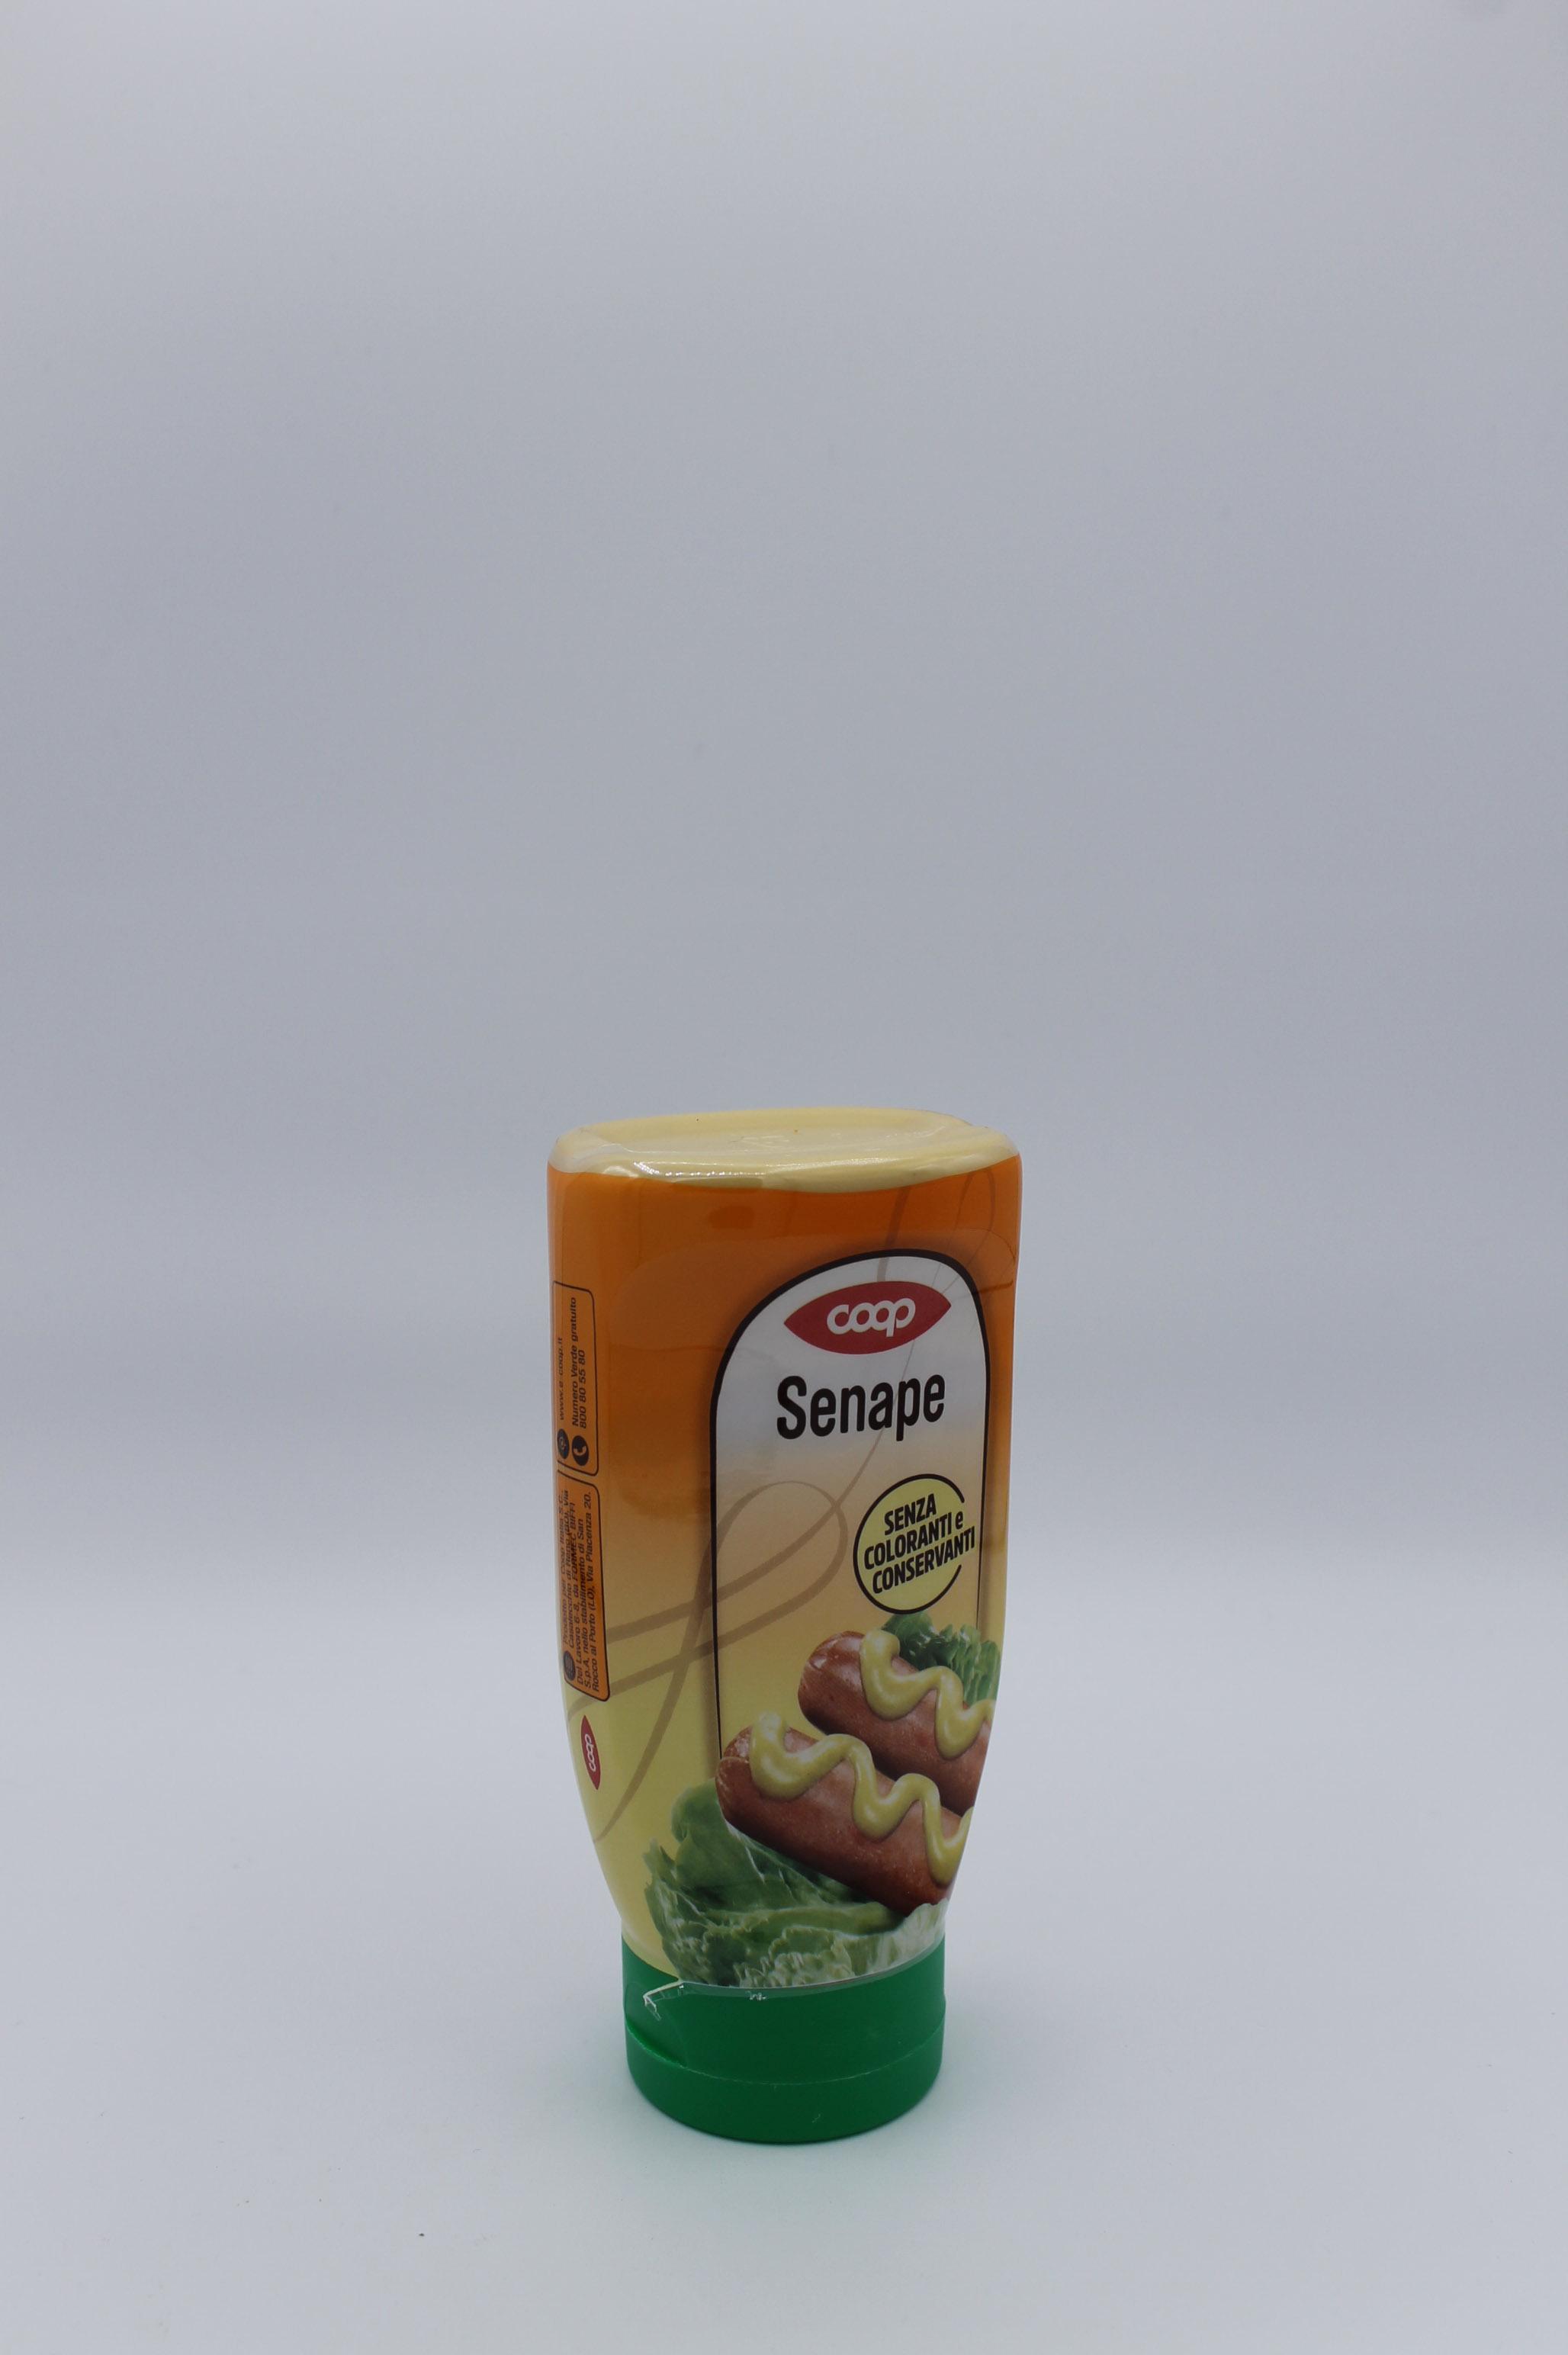 Coop senape 250 gr.